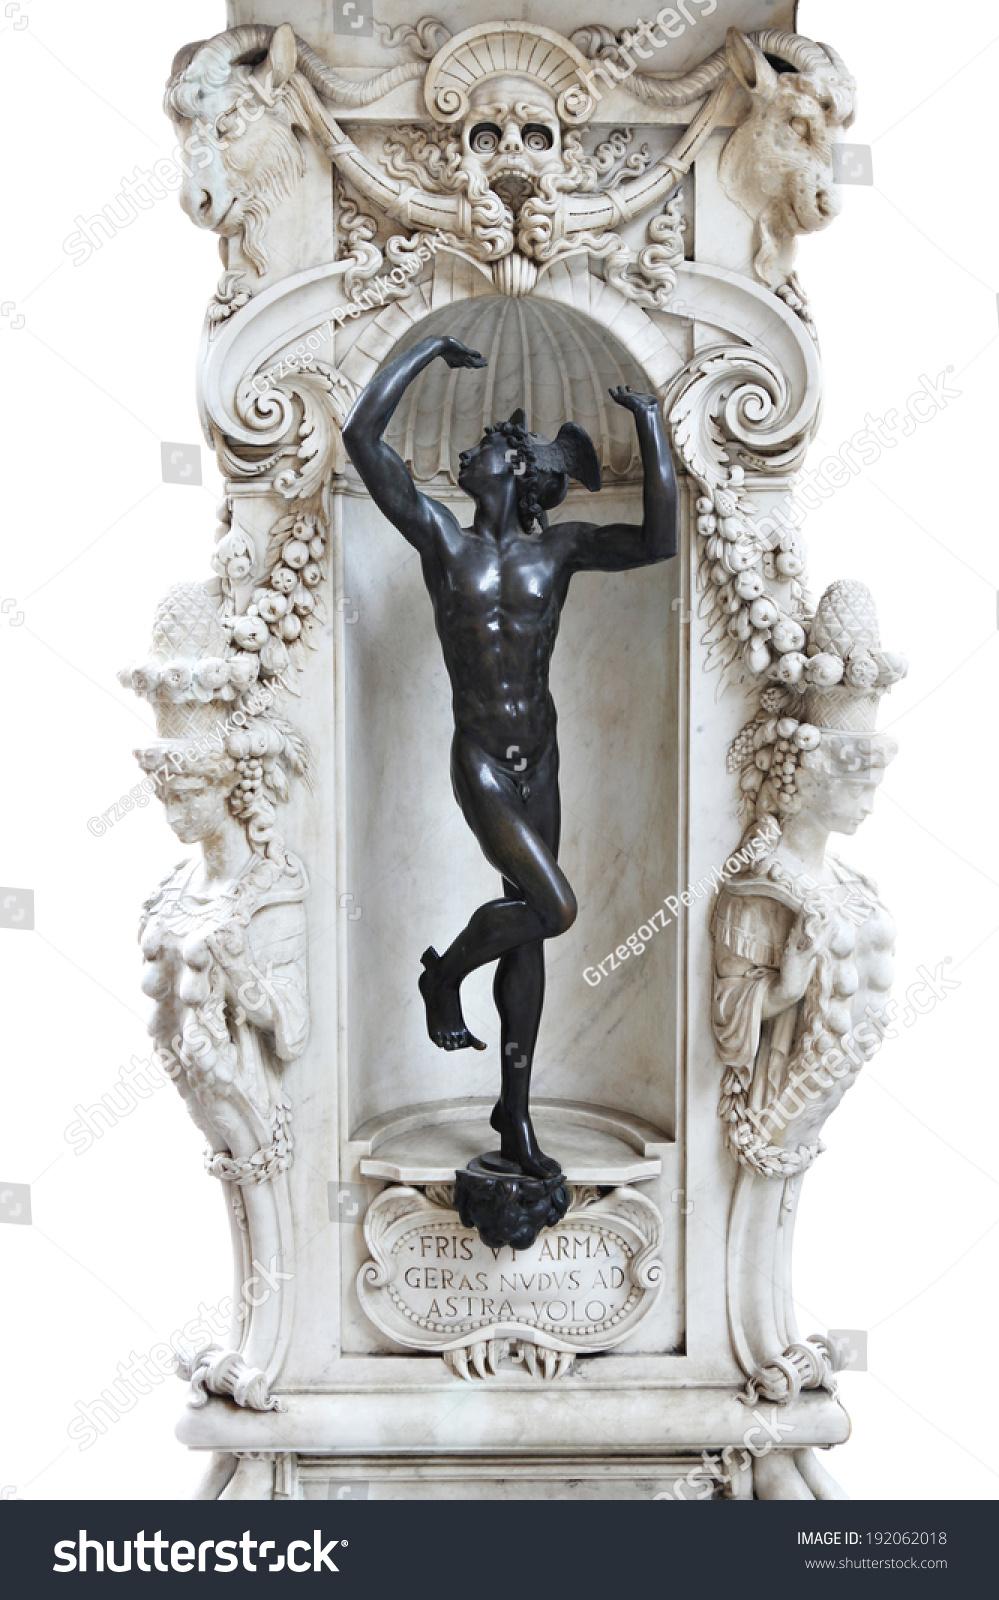 Statue Hermes Part Marble Base Pereseus Stock Photo ...